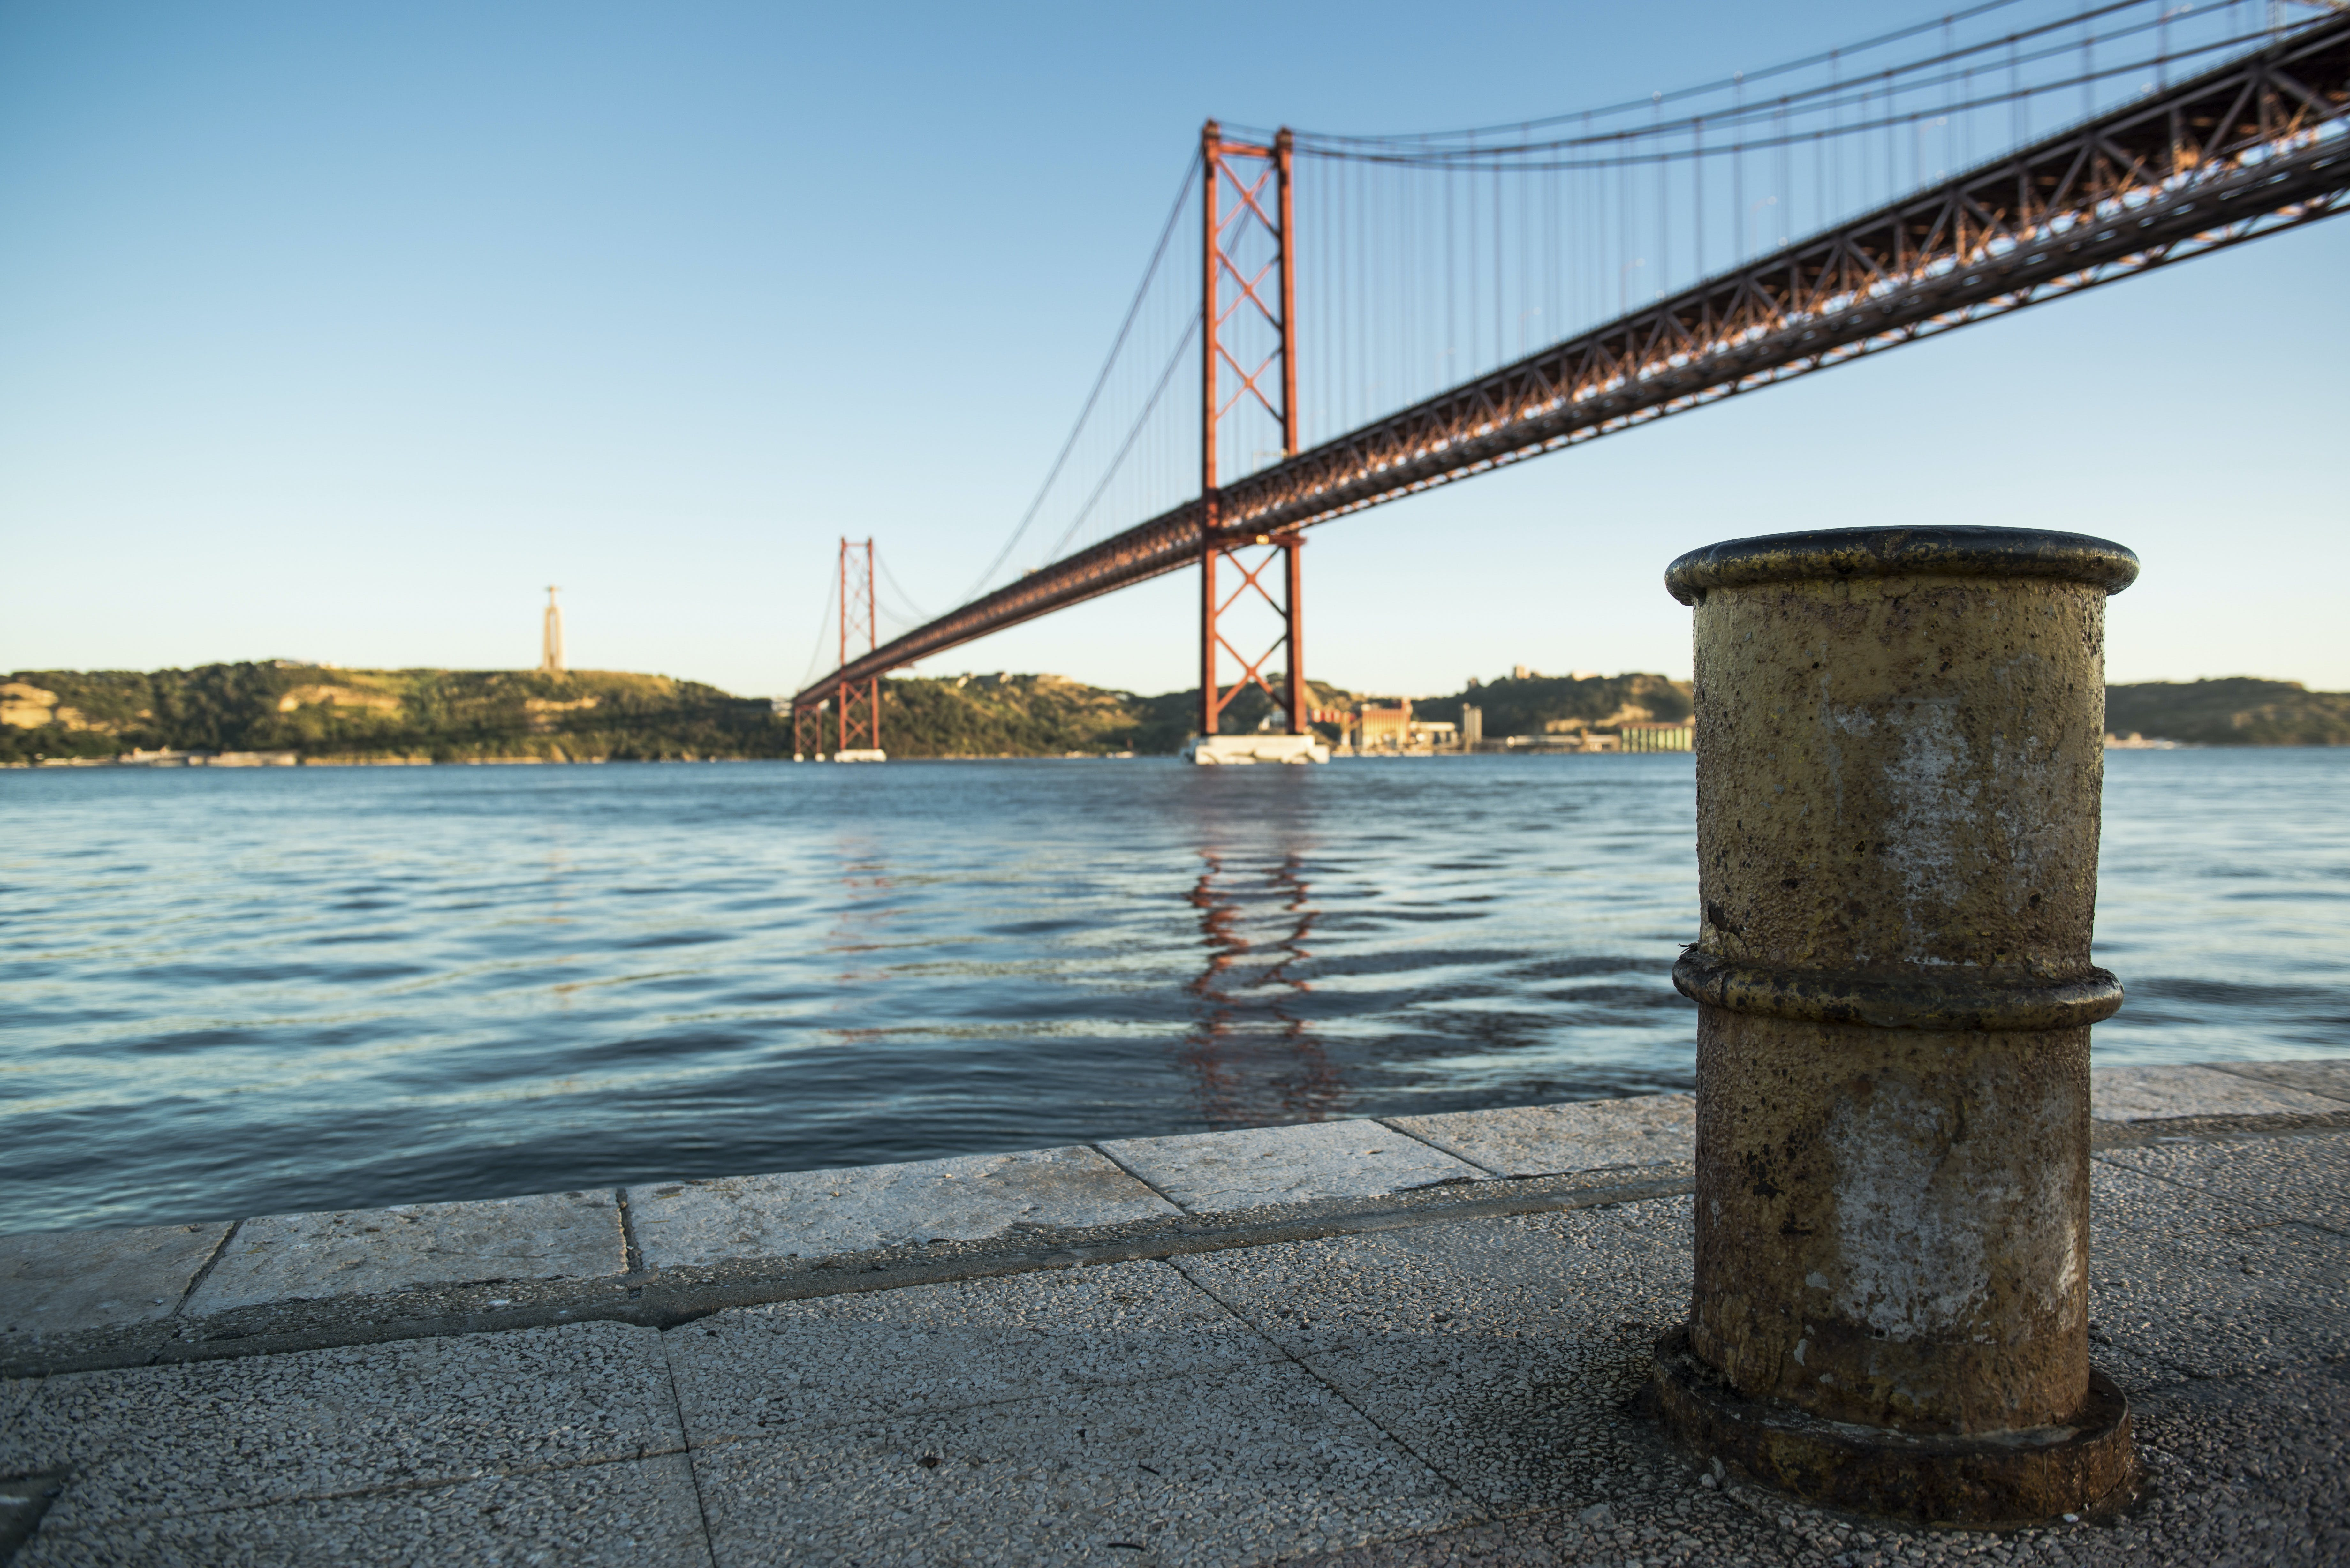 Suspension Bridge over Body of Water